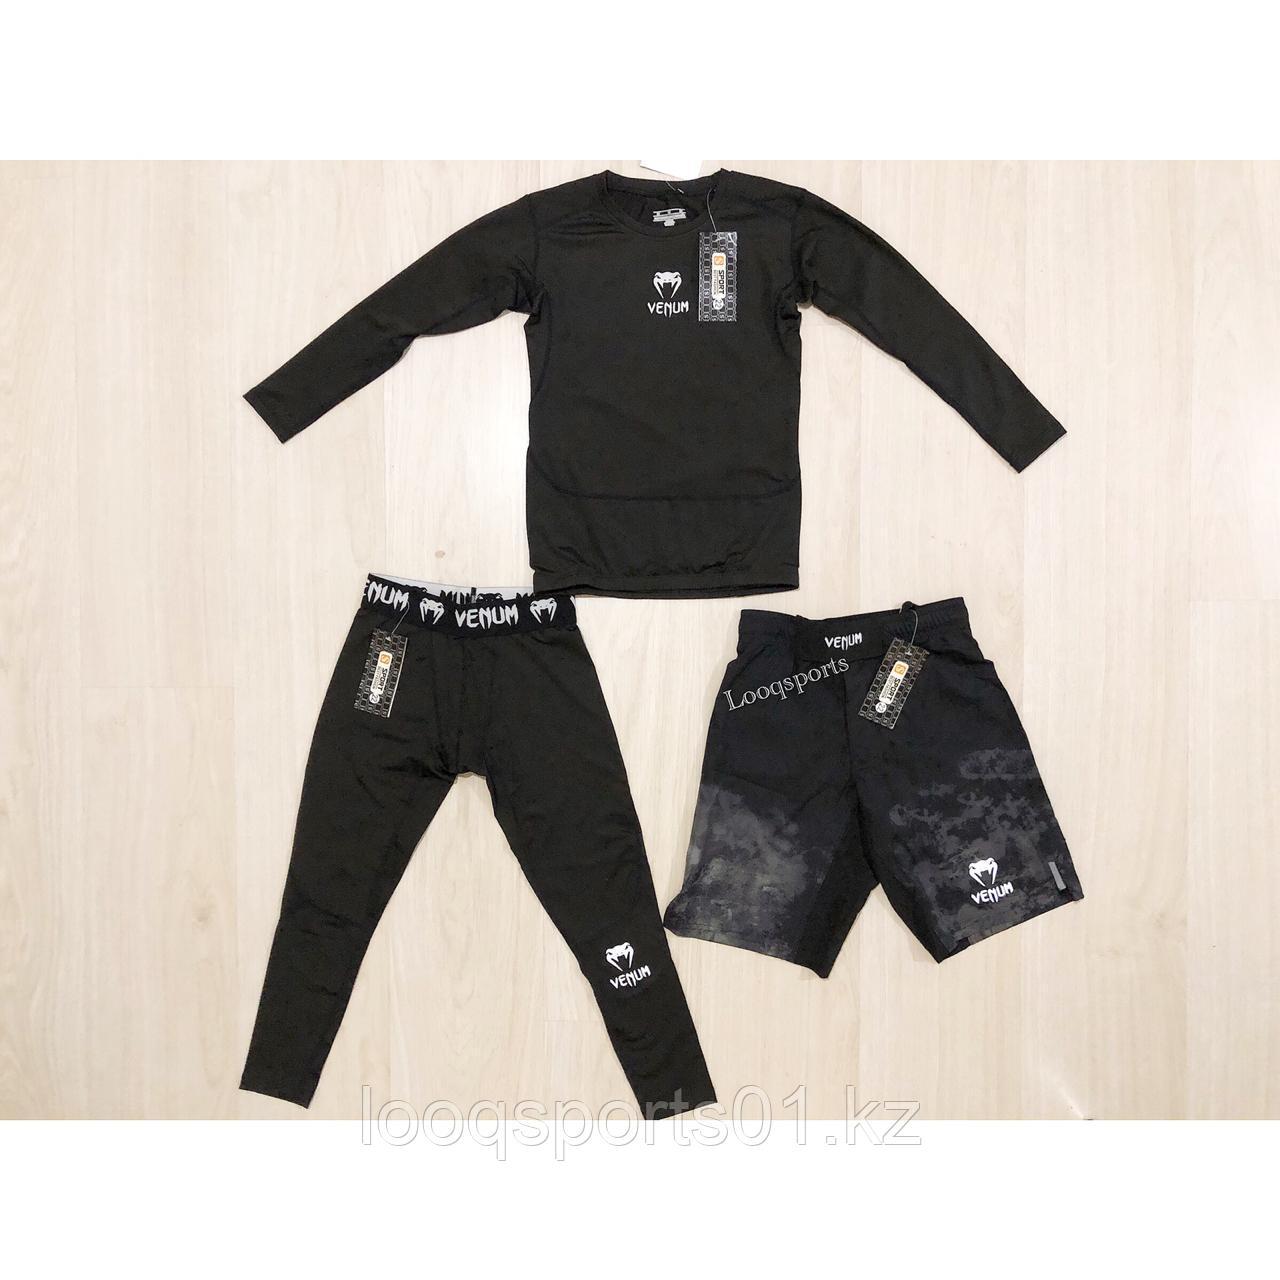 Детский комплект Venum 3в1 (Рашгард + шорты мма + леггинсы)